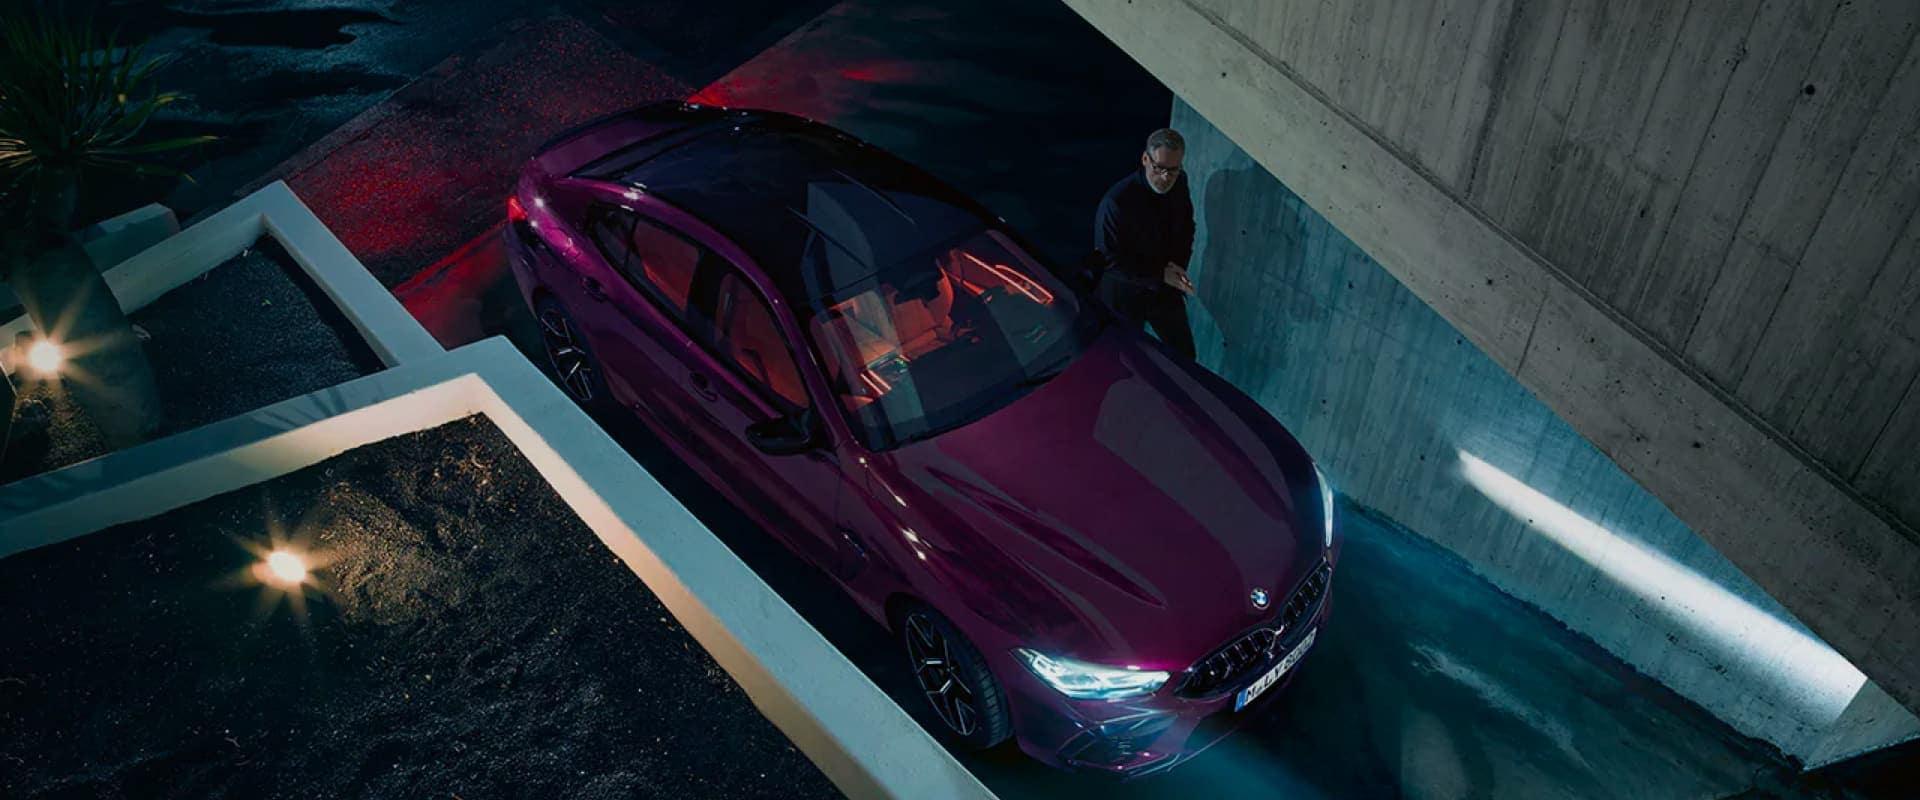 Man with BMW in drivethrough